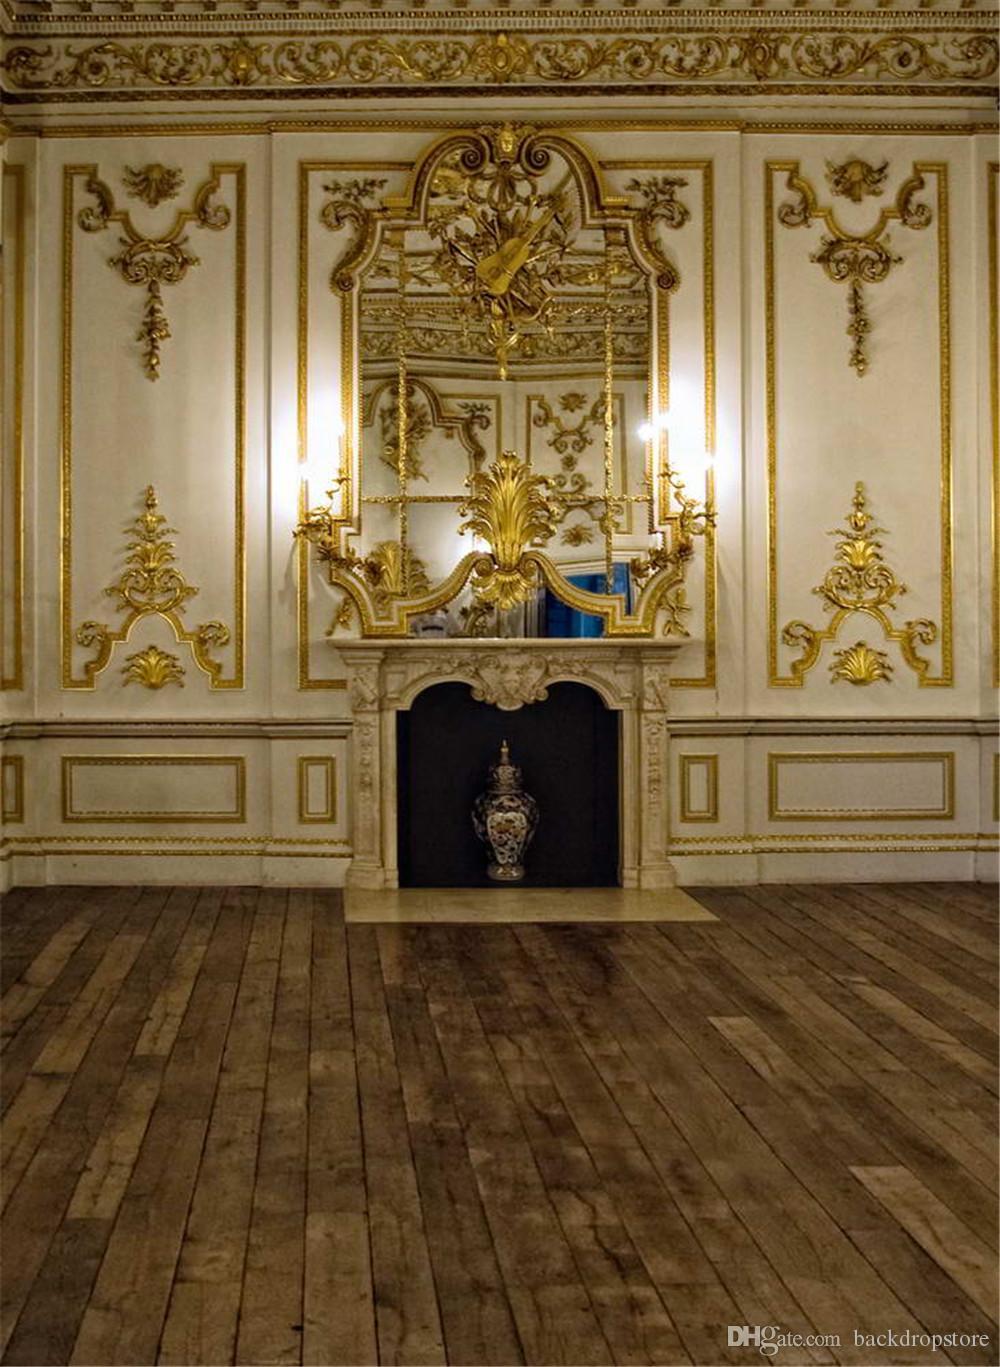 Luxury Palace Gold Mosaic Wall Fondali Fotografia Vinile Tessuto Digital Stampato Indoor Wedding Party Studio fotografico Sfondo Pavimento in legno